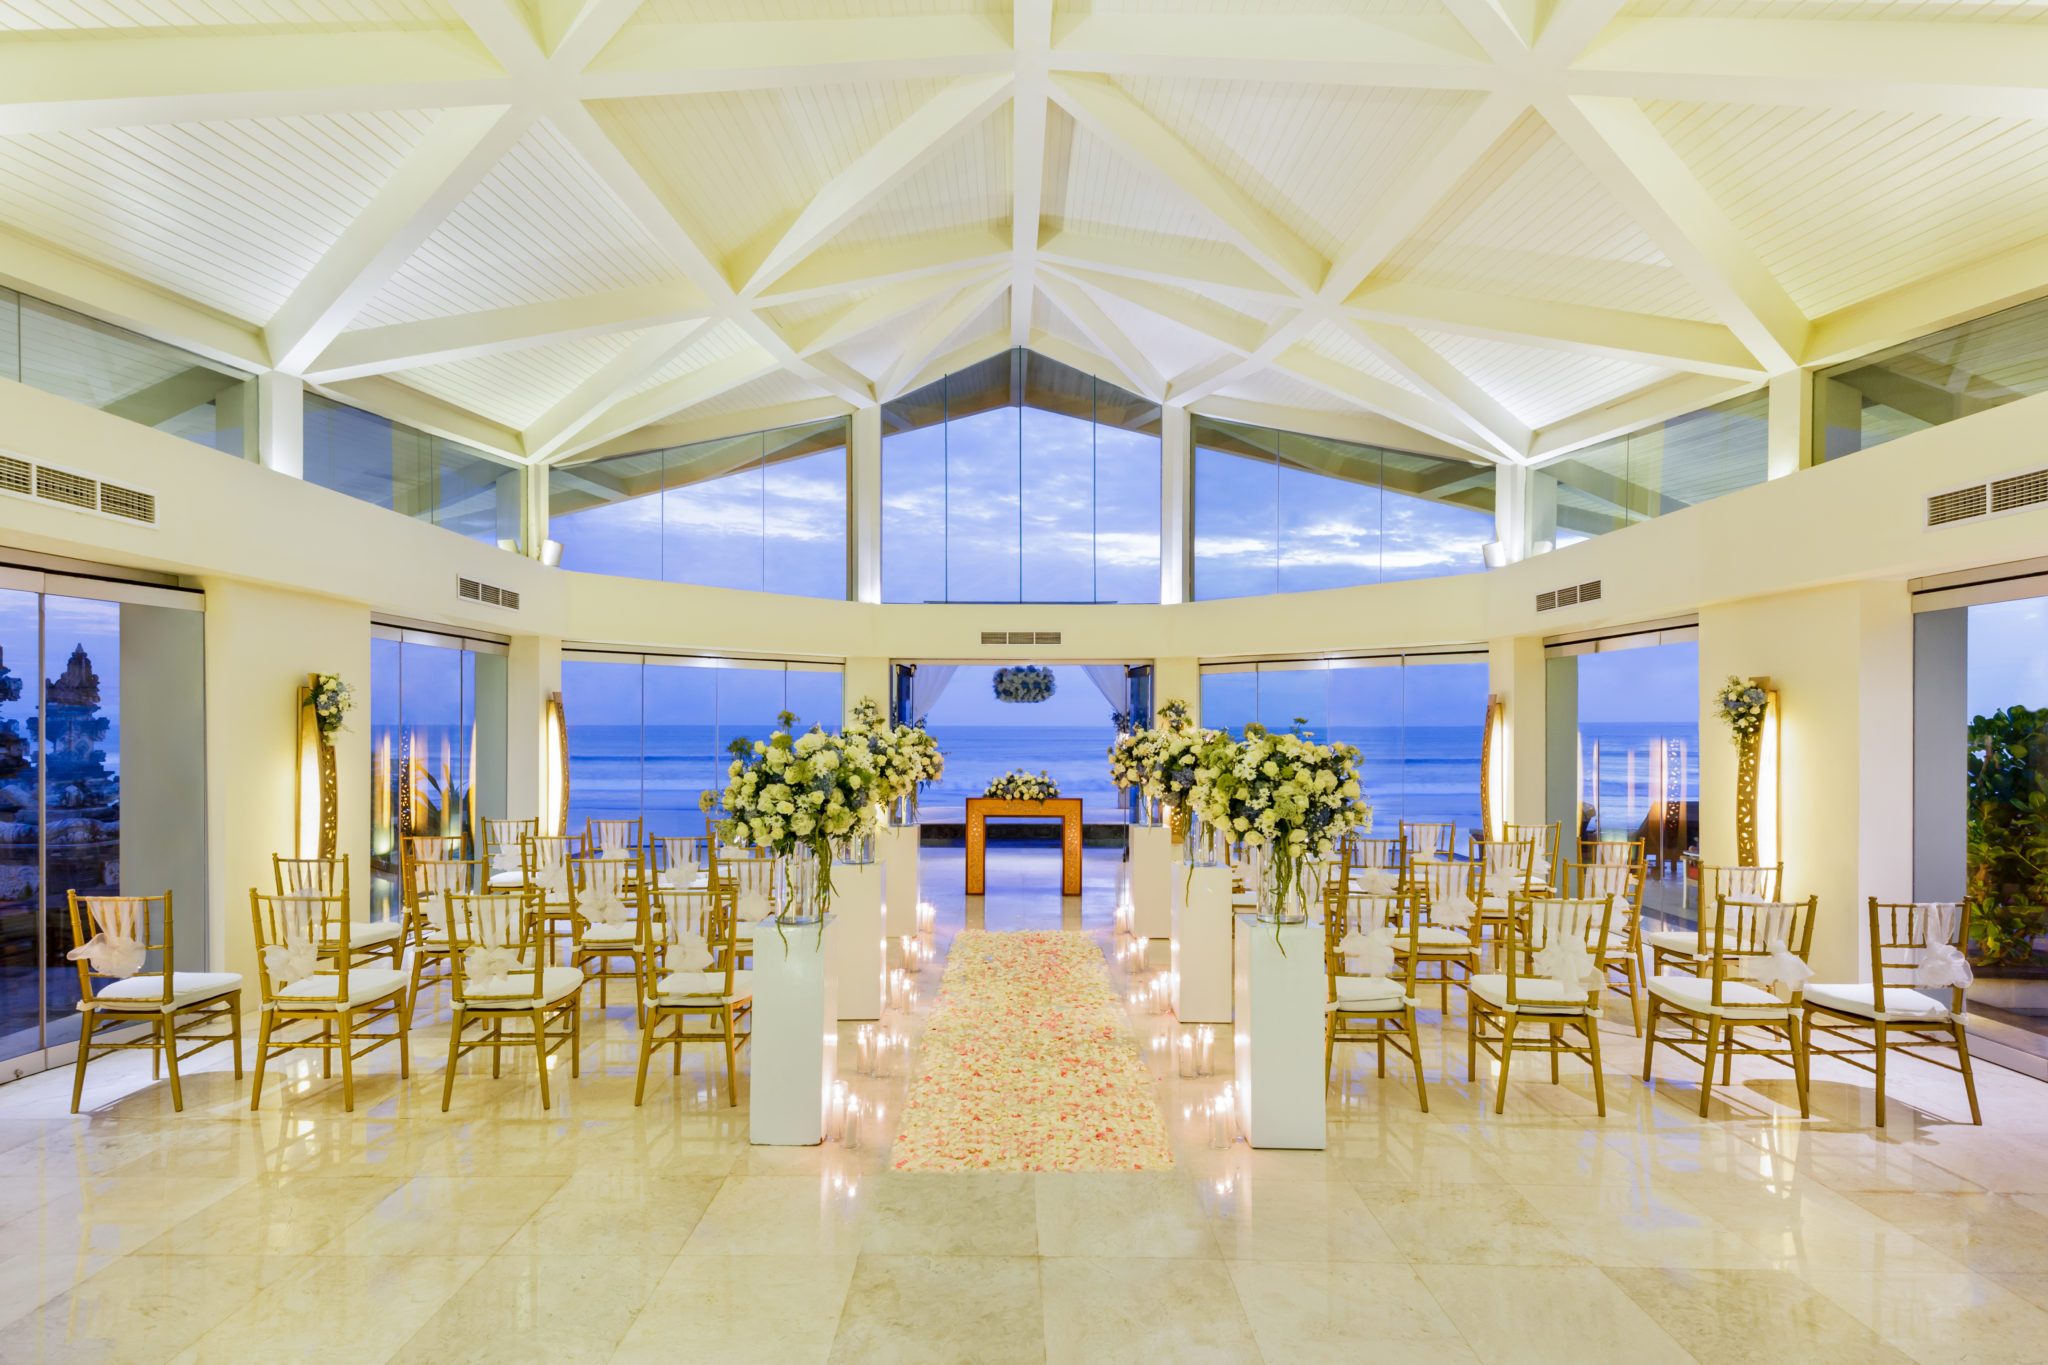 811193f30299b0fb org - A Destination Wedding of your Dreams at The Seminyak Beach Resort & Spa, Bali